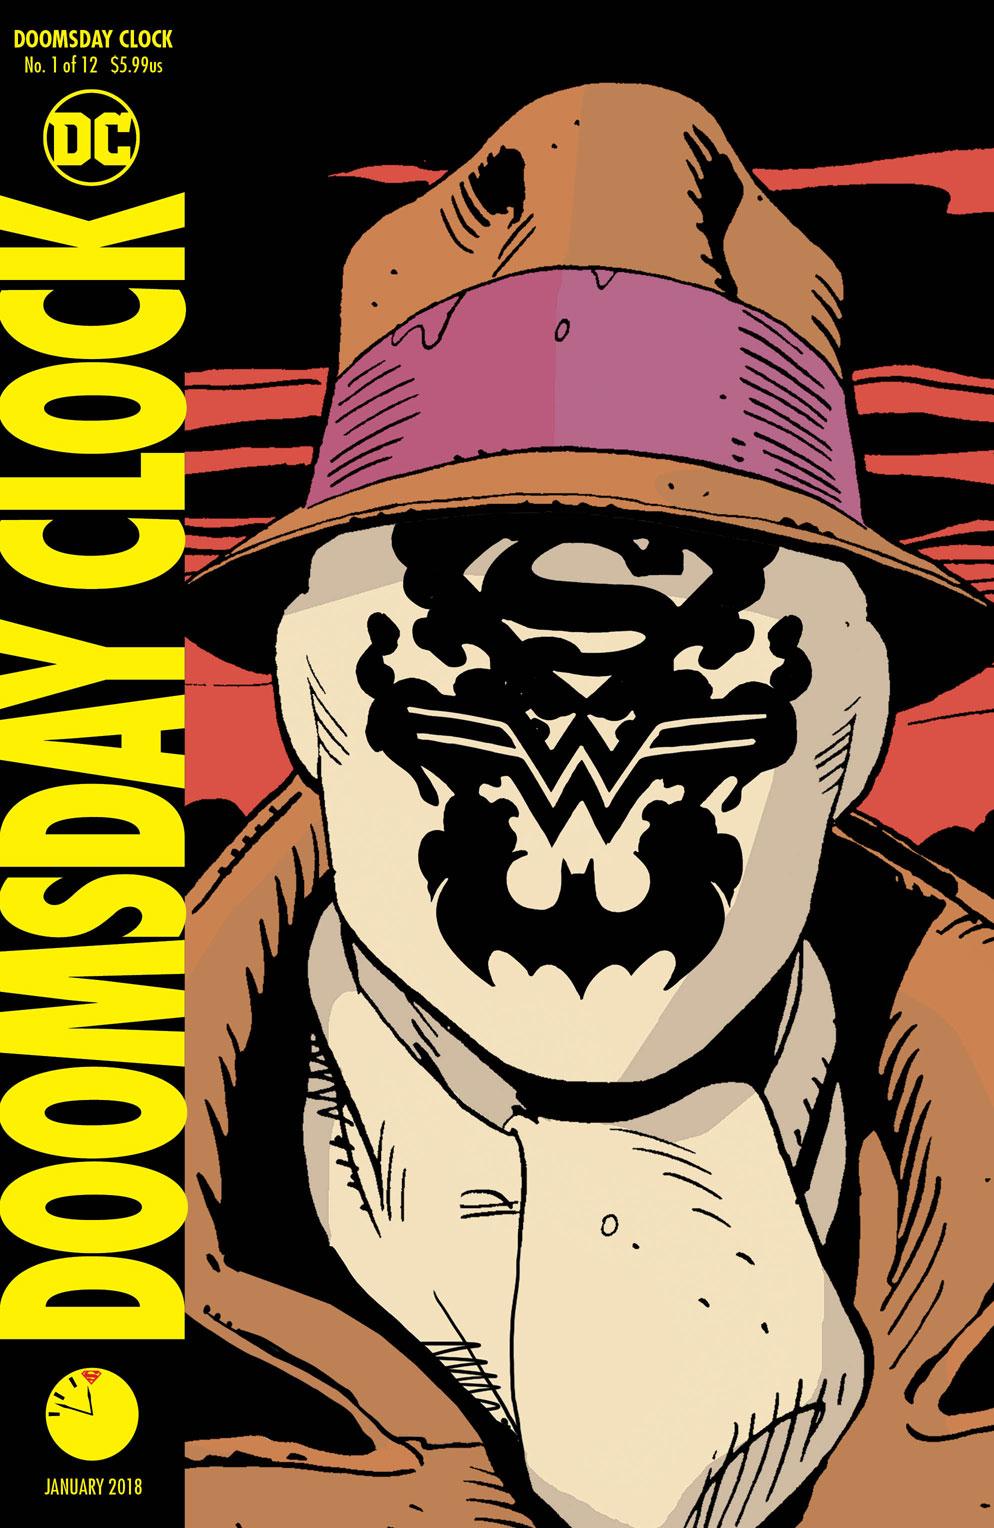 Doomsday Clock Lenticular - DC Comics News